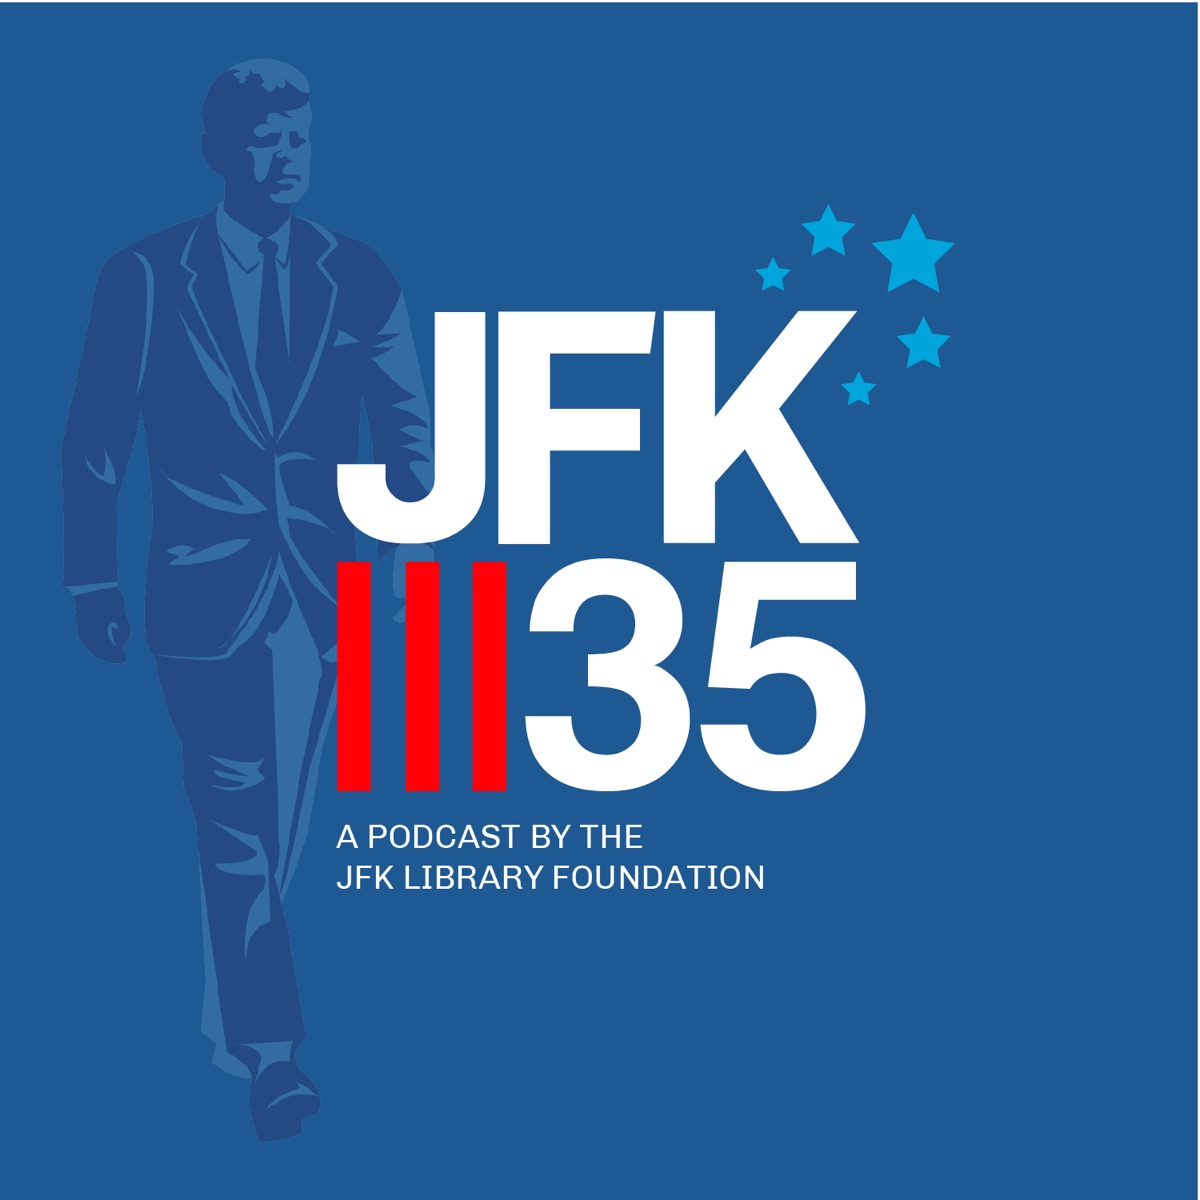 JFK35